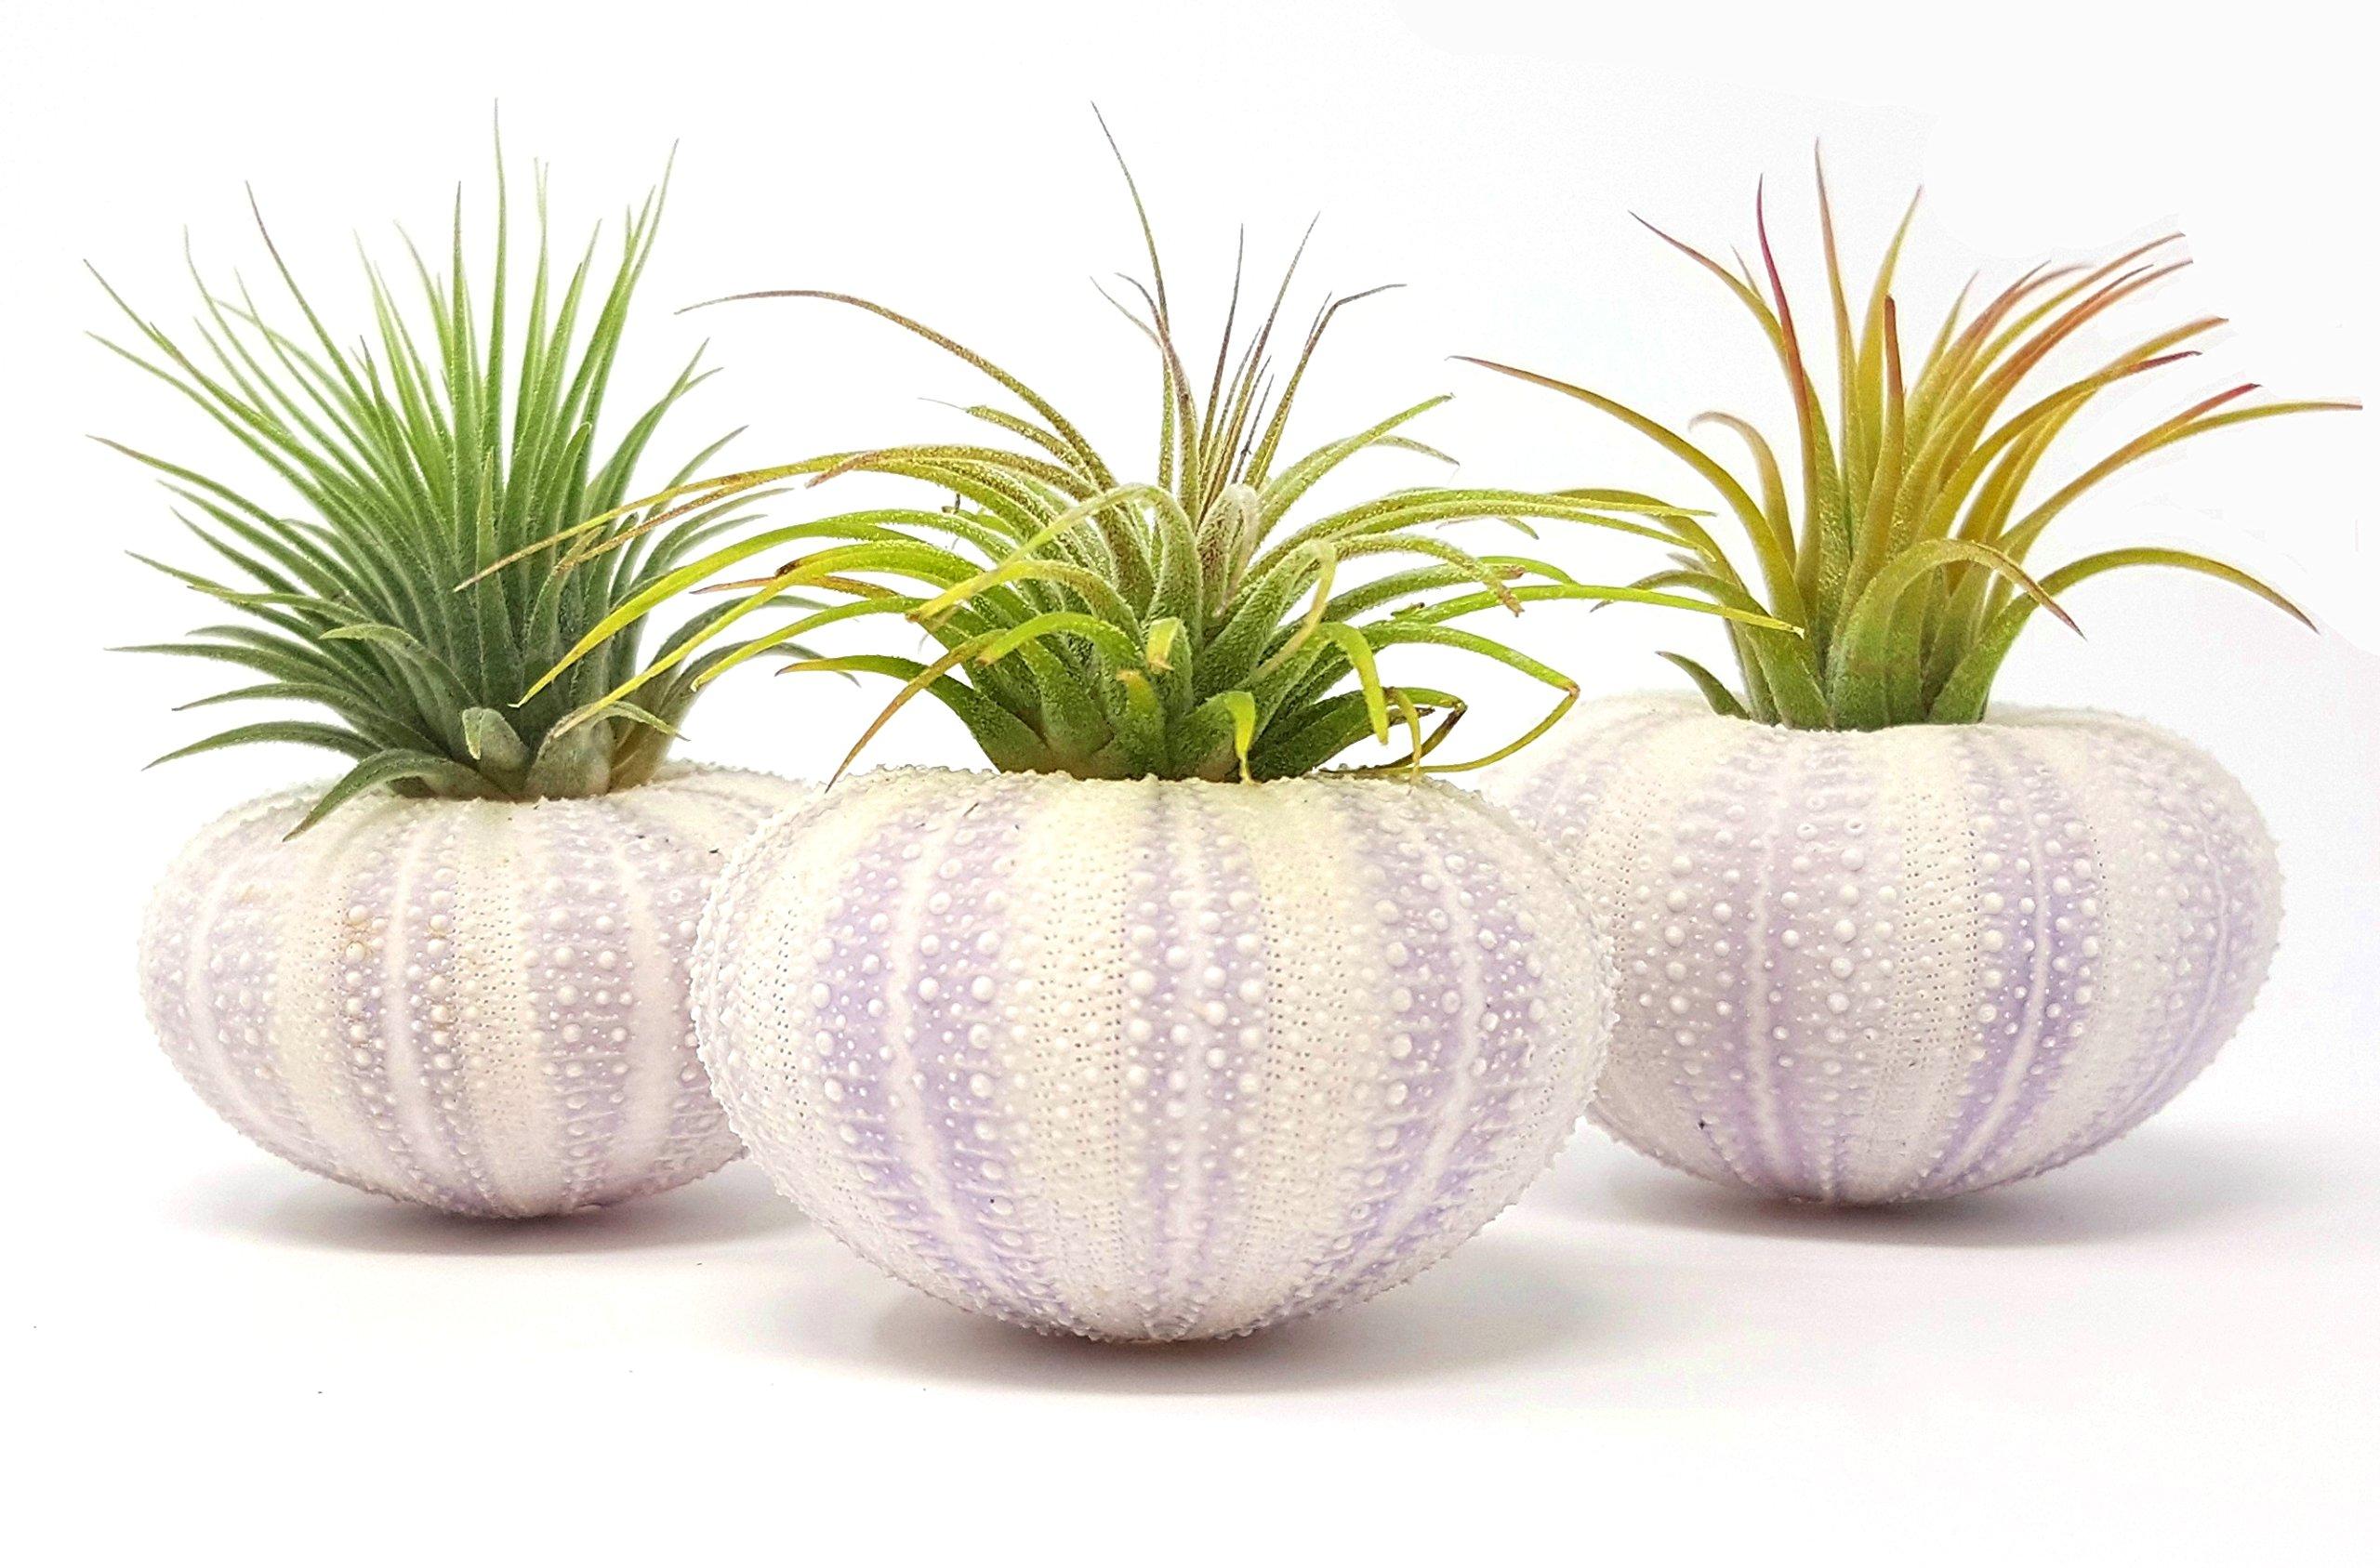 Aura Creations 3 pcs Purple Sea Urchin Air Plant Lot/Kit includes 3 Tillandsia Plants and 3 Urchin Shells